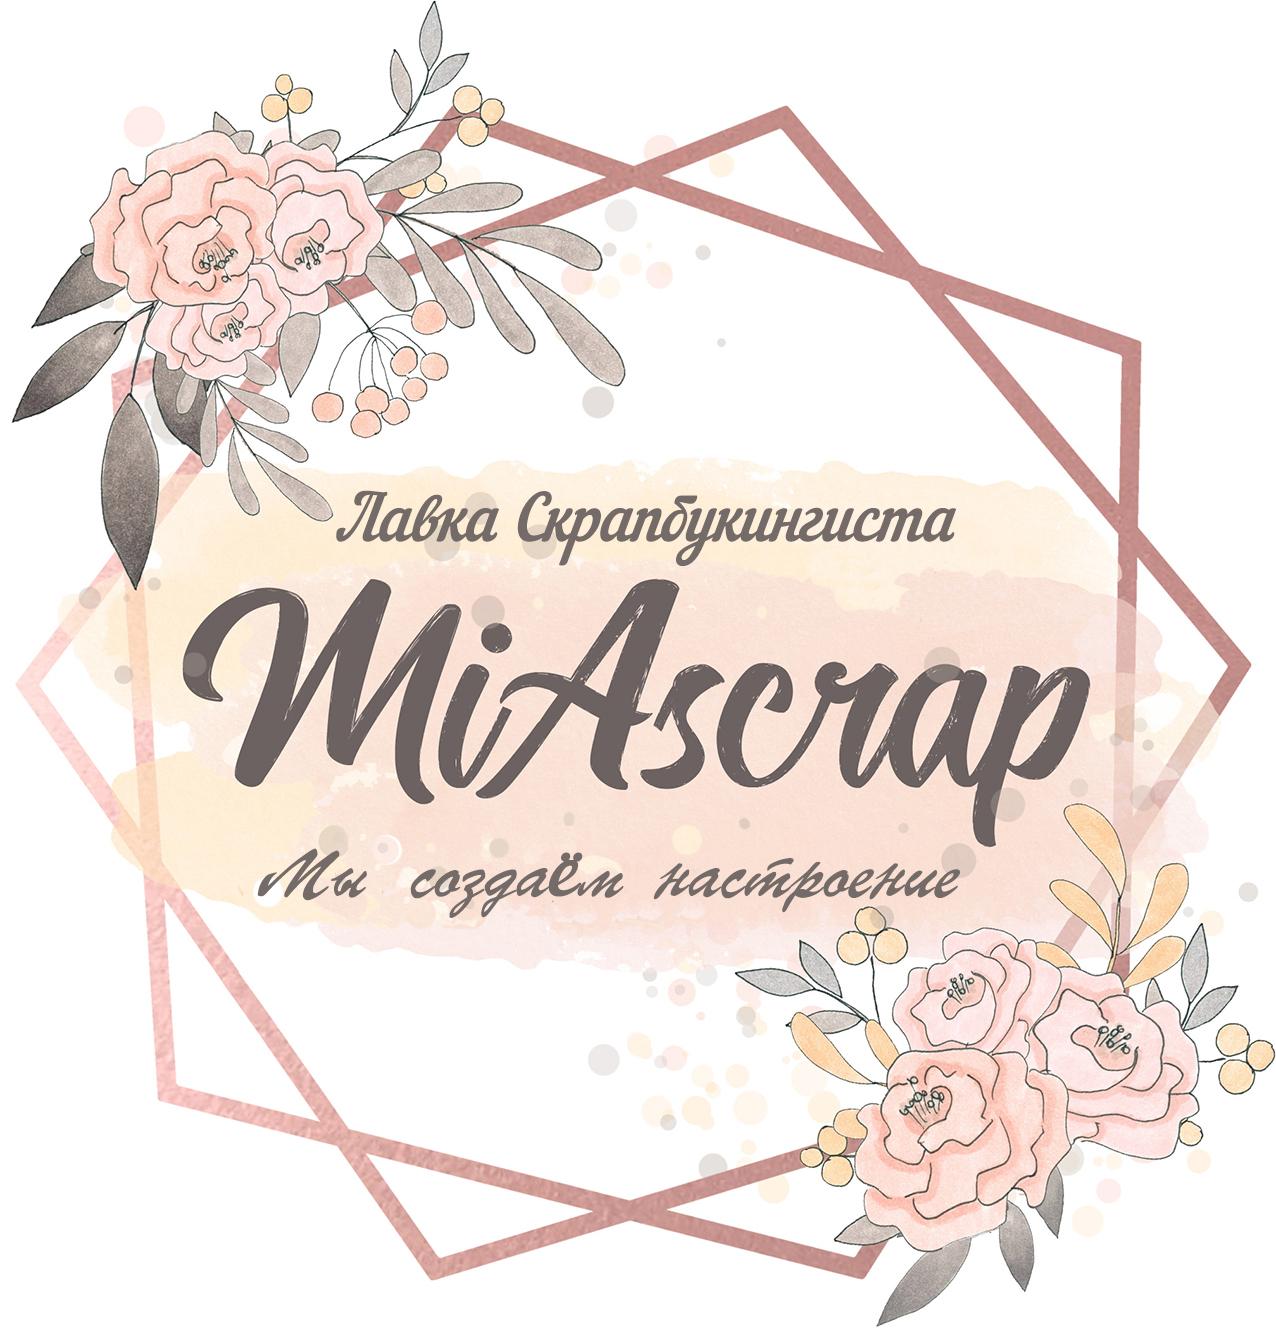 ТМ MiAscrap